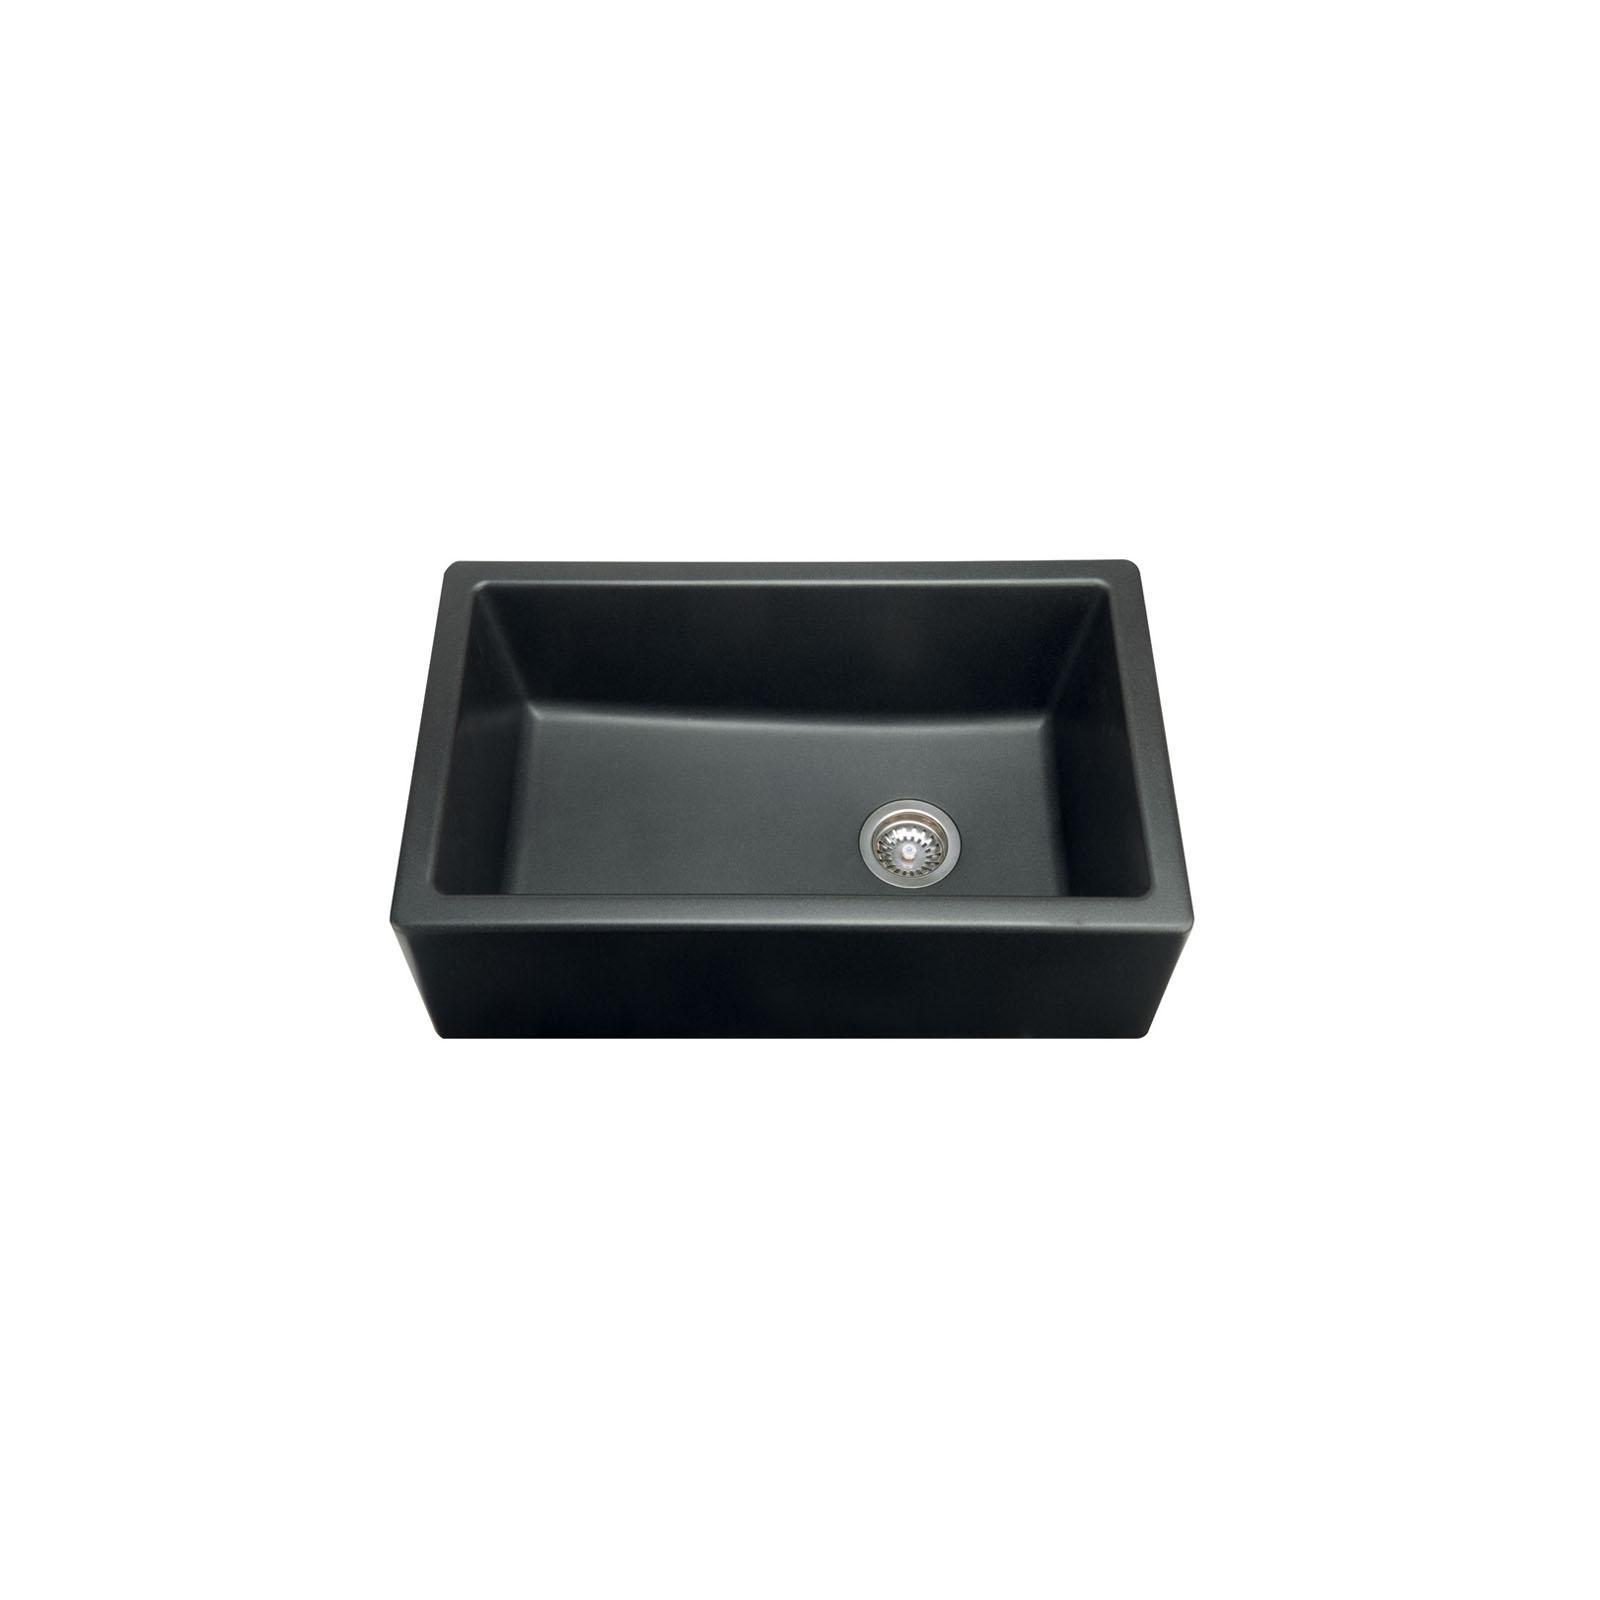 High-quality sink Philippe II granit black - one bowl